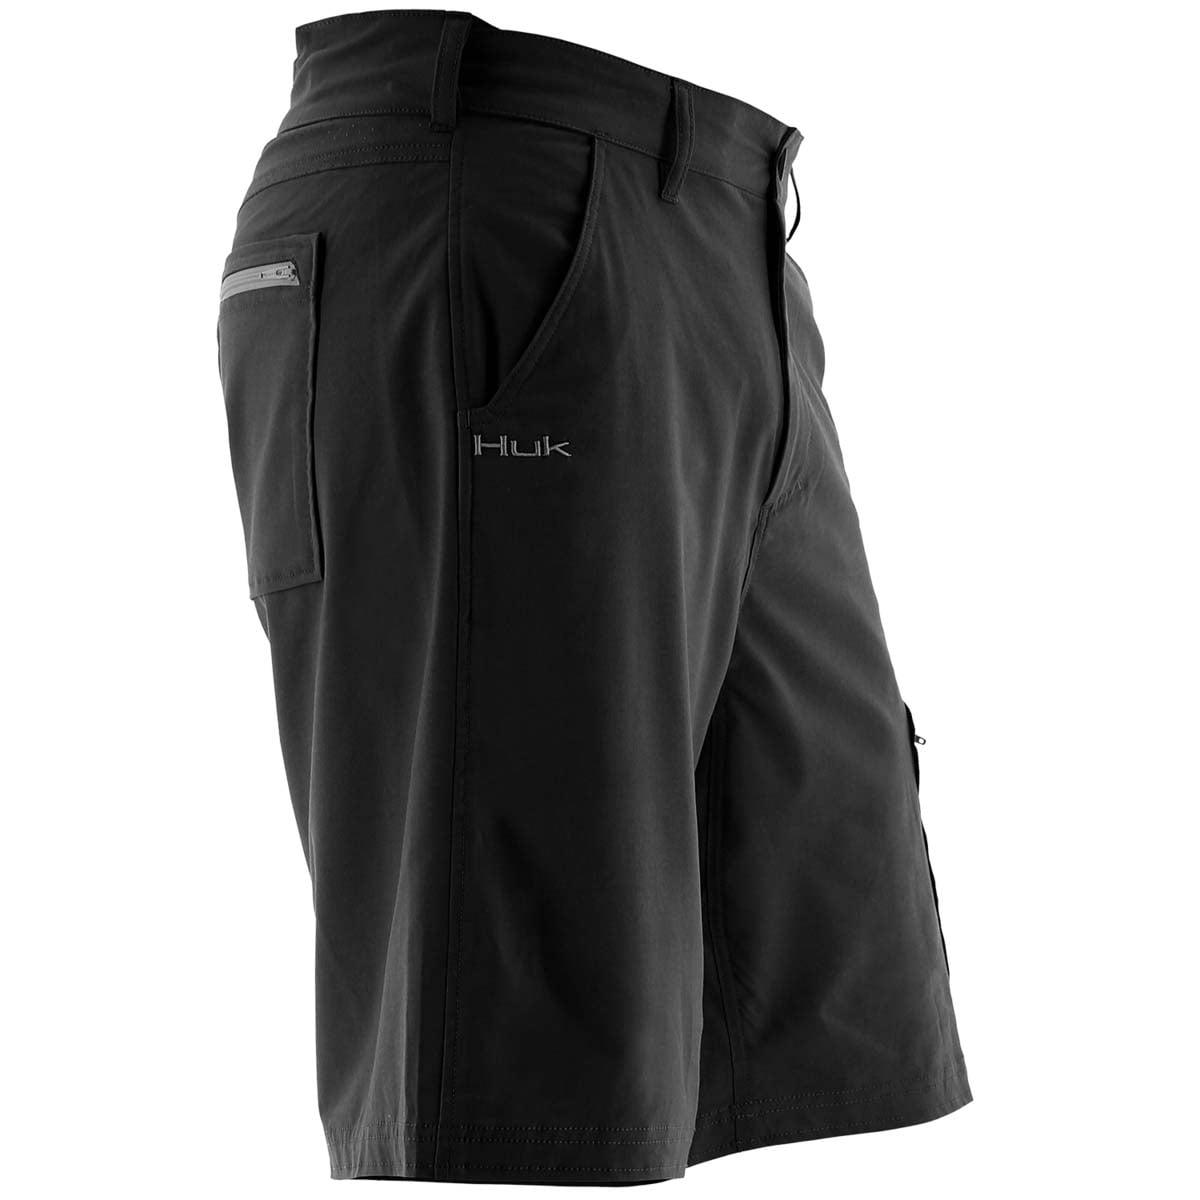 "Huk Men/'s Next Level Performance 10.5/"" Fishing Shorts"